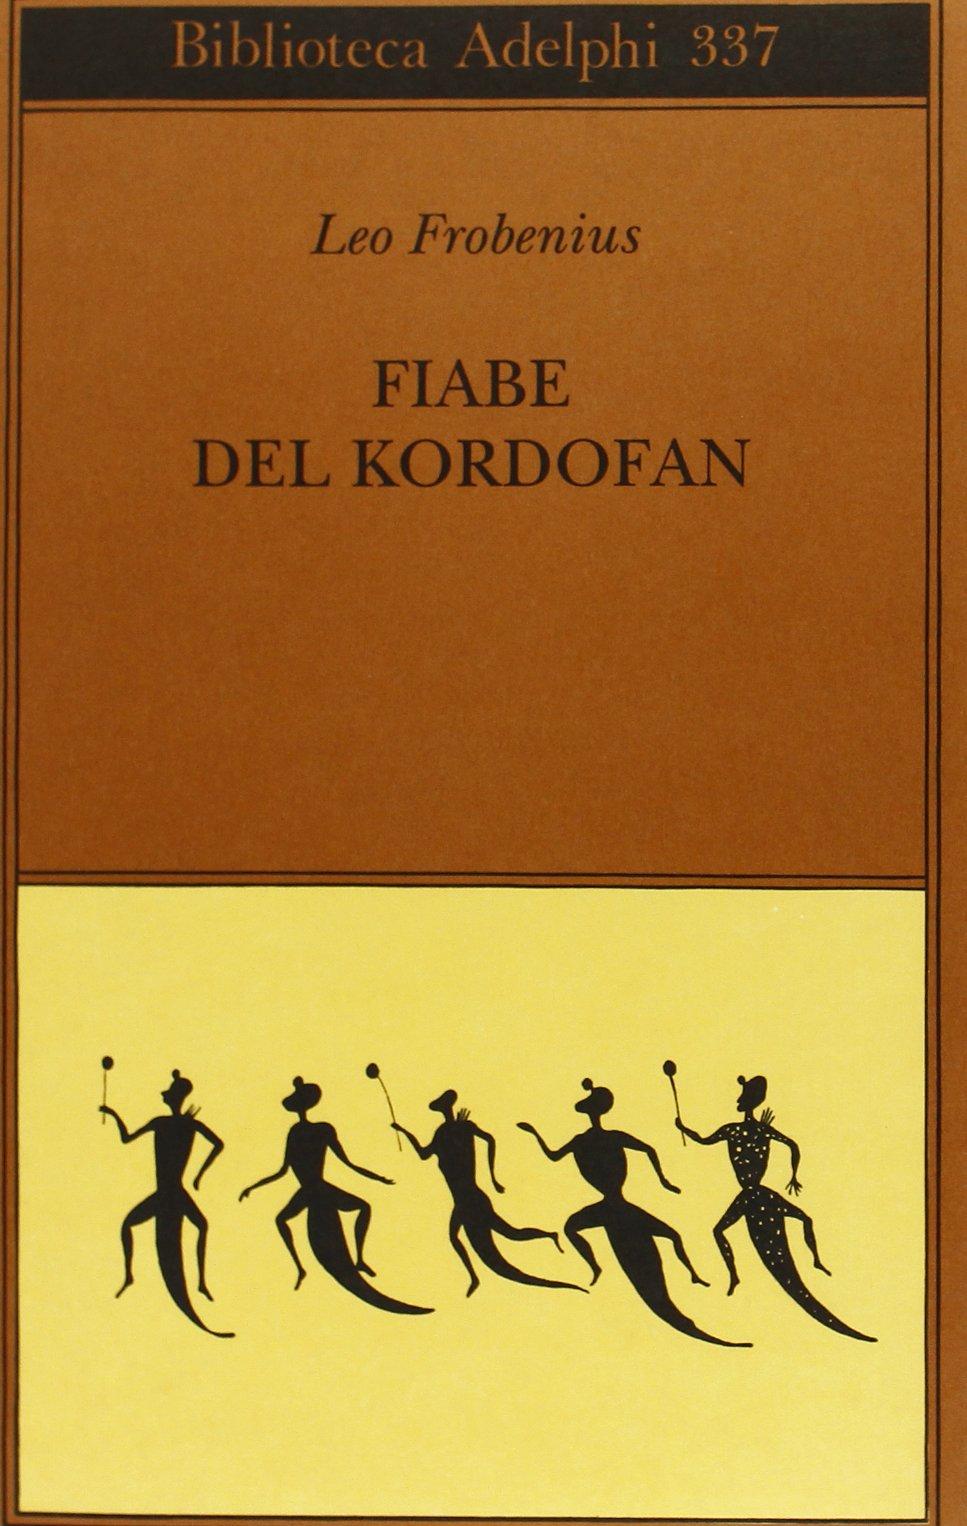 Fiabe del Kordofan Copertina flessibile – 7 mag 1997 Leo Frobenius U. Colla Adelphi 8845912744